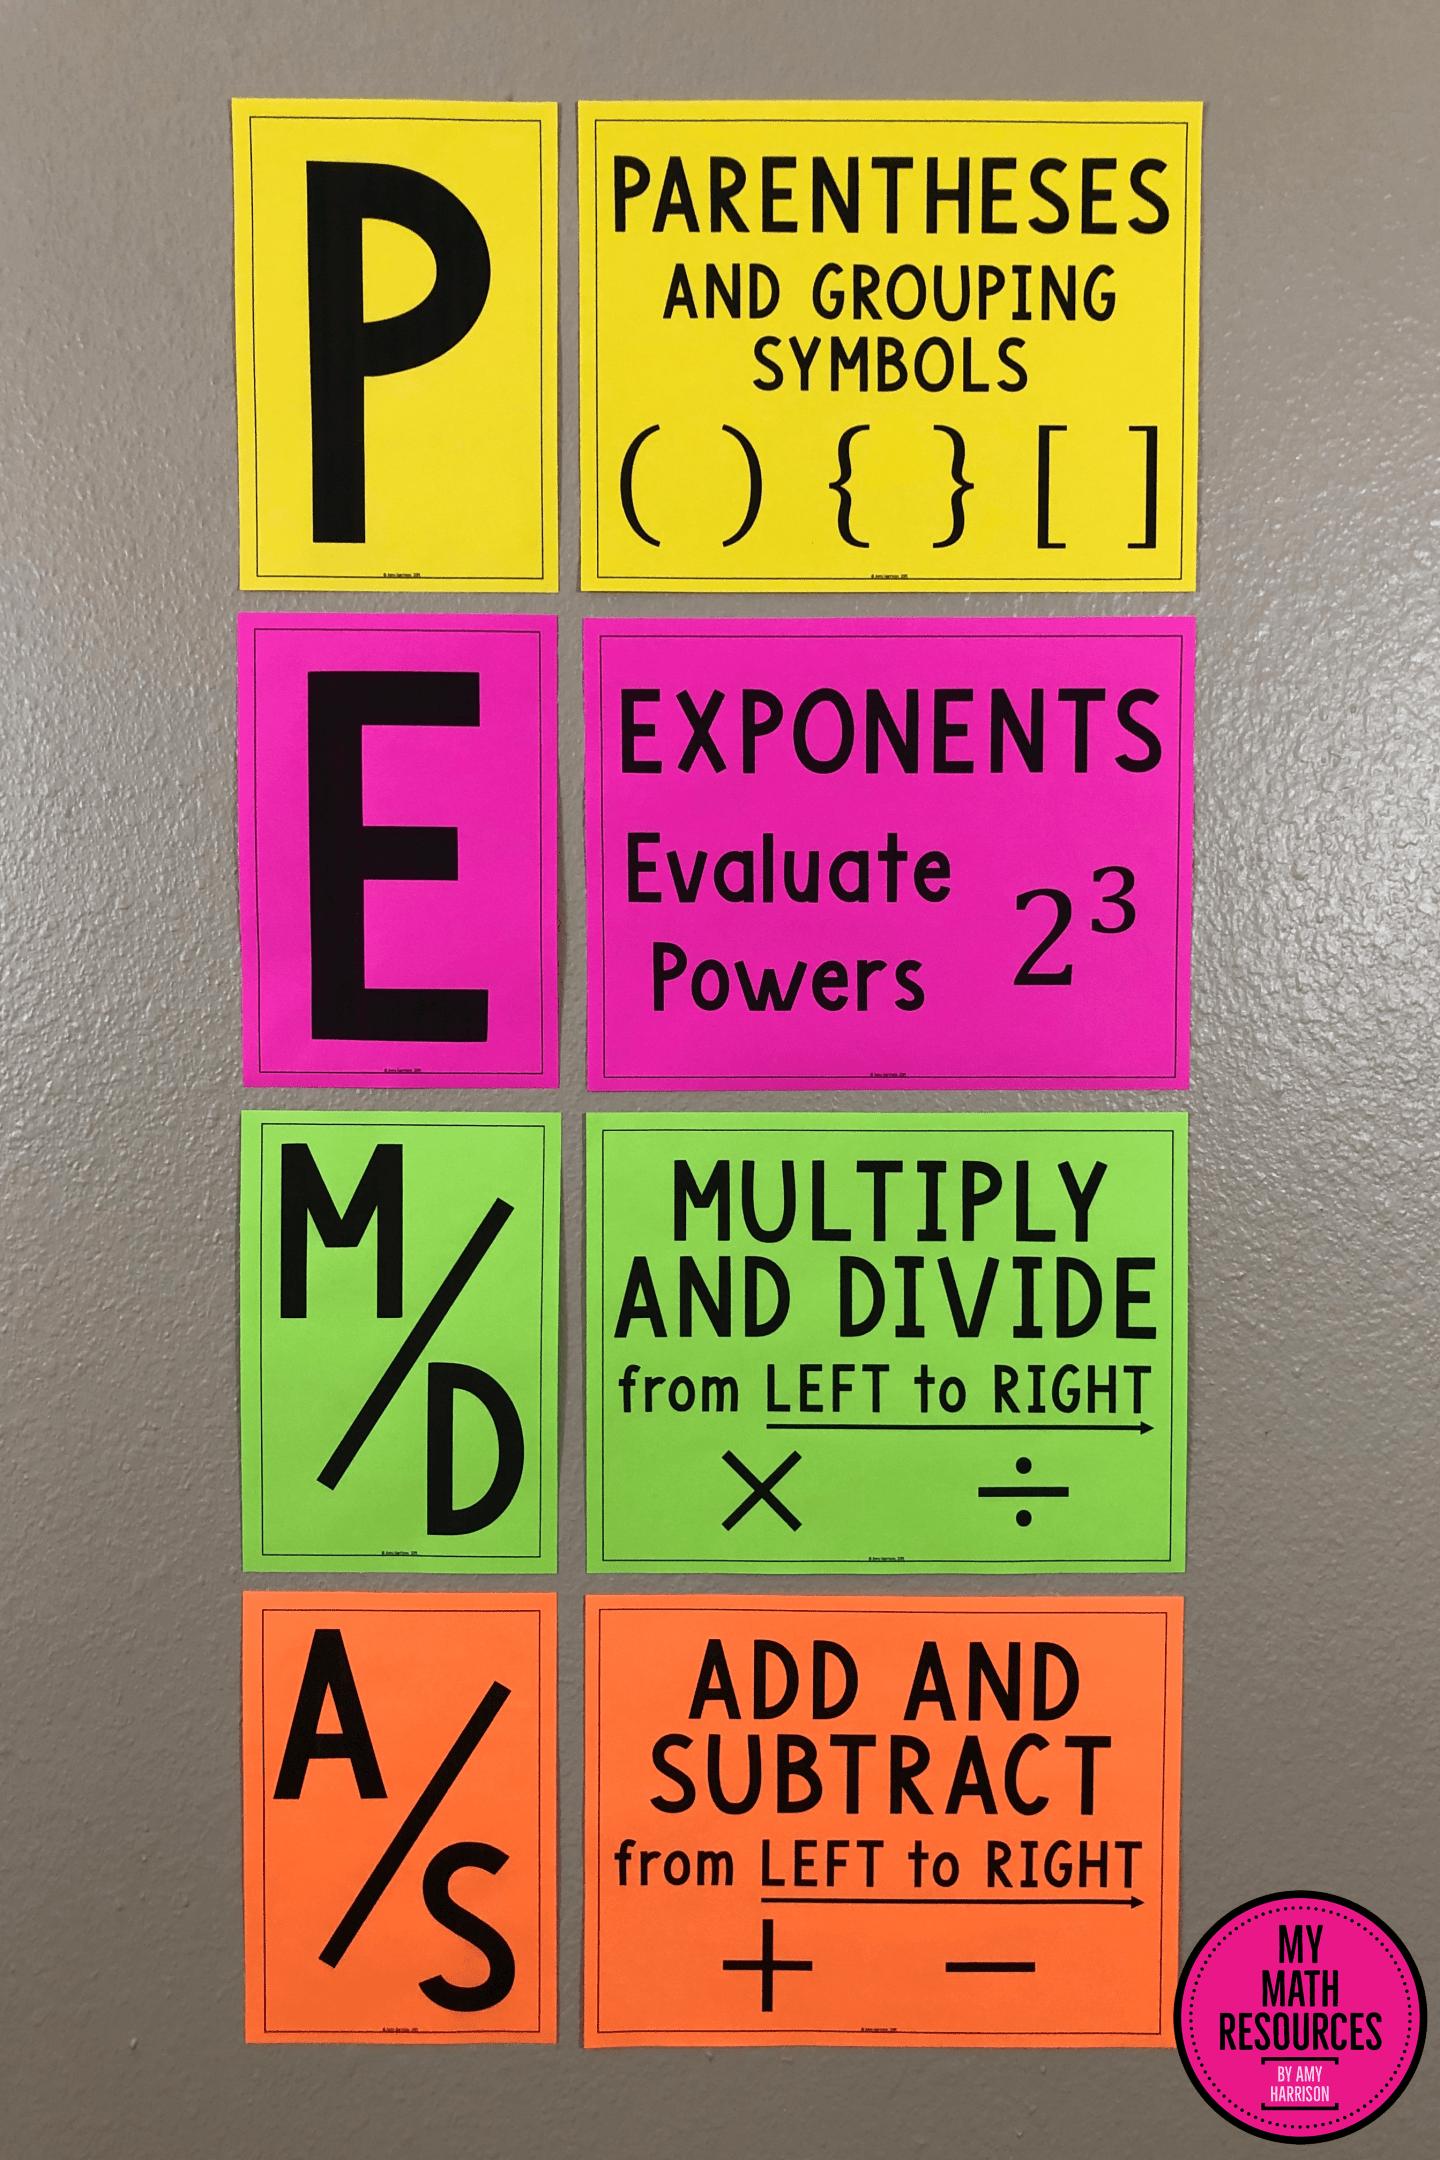 8th Grade Math Worksheets Free Printable Math Worksheets Probability Worksheets Free Math Worksheets [ 3174 x 2350 Pixel ]